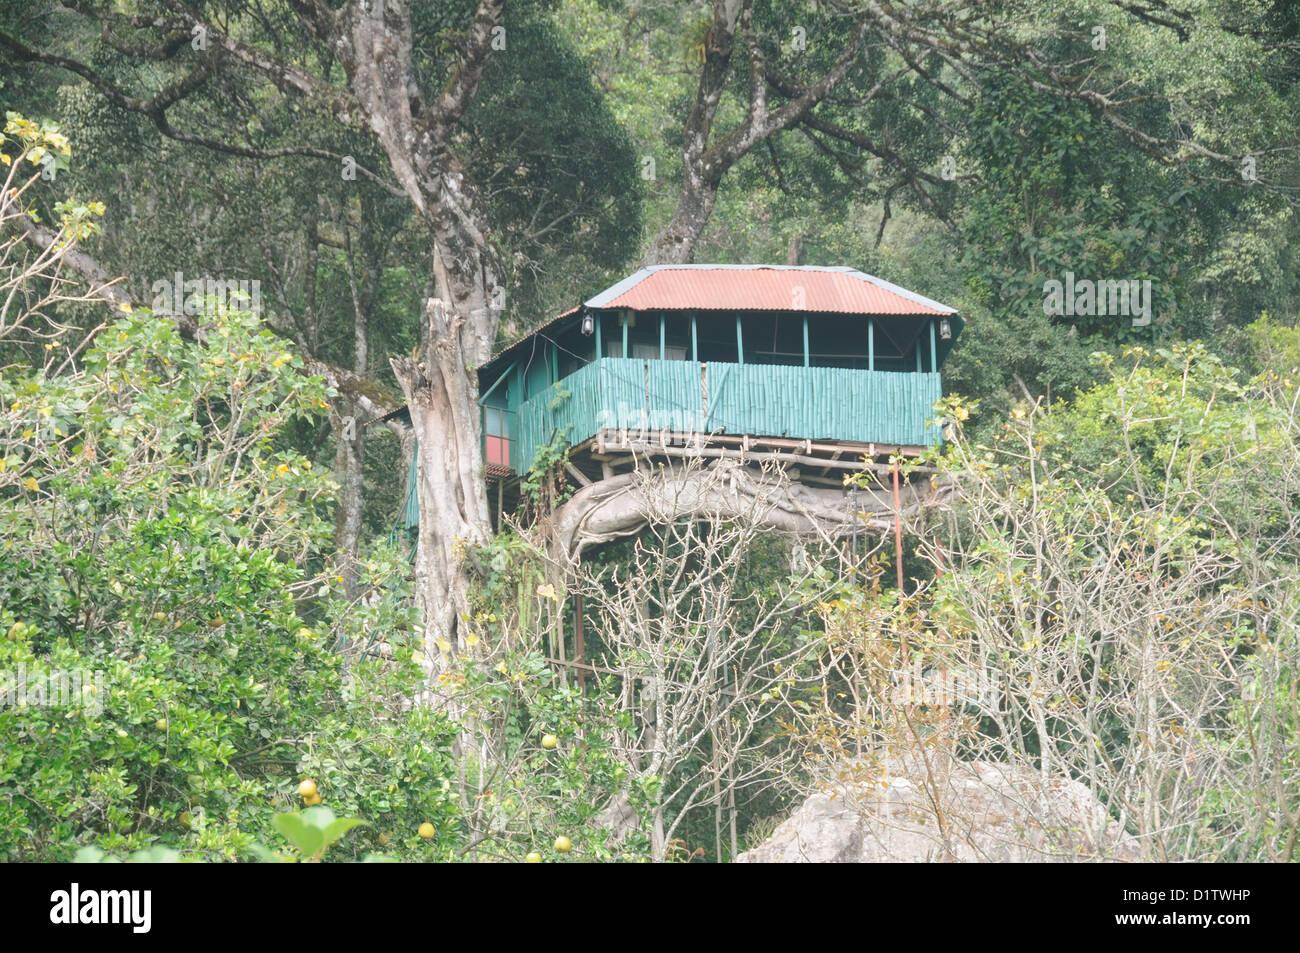 Tree houses, treehouses, or tree forts. Munnar Kerala India - Stock Image